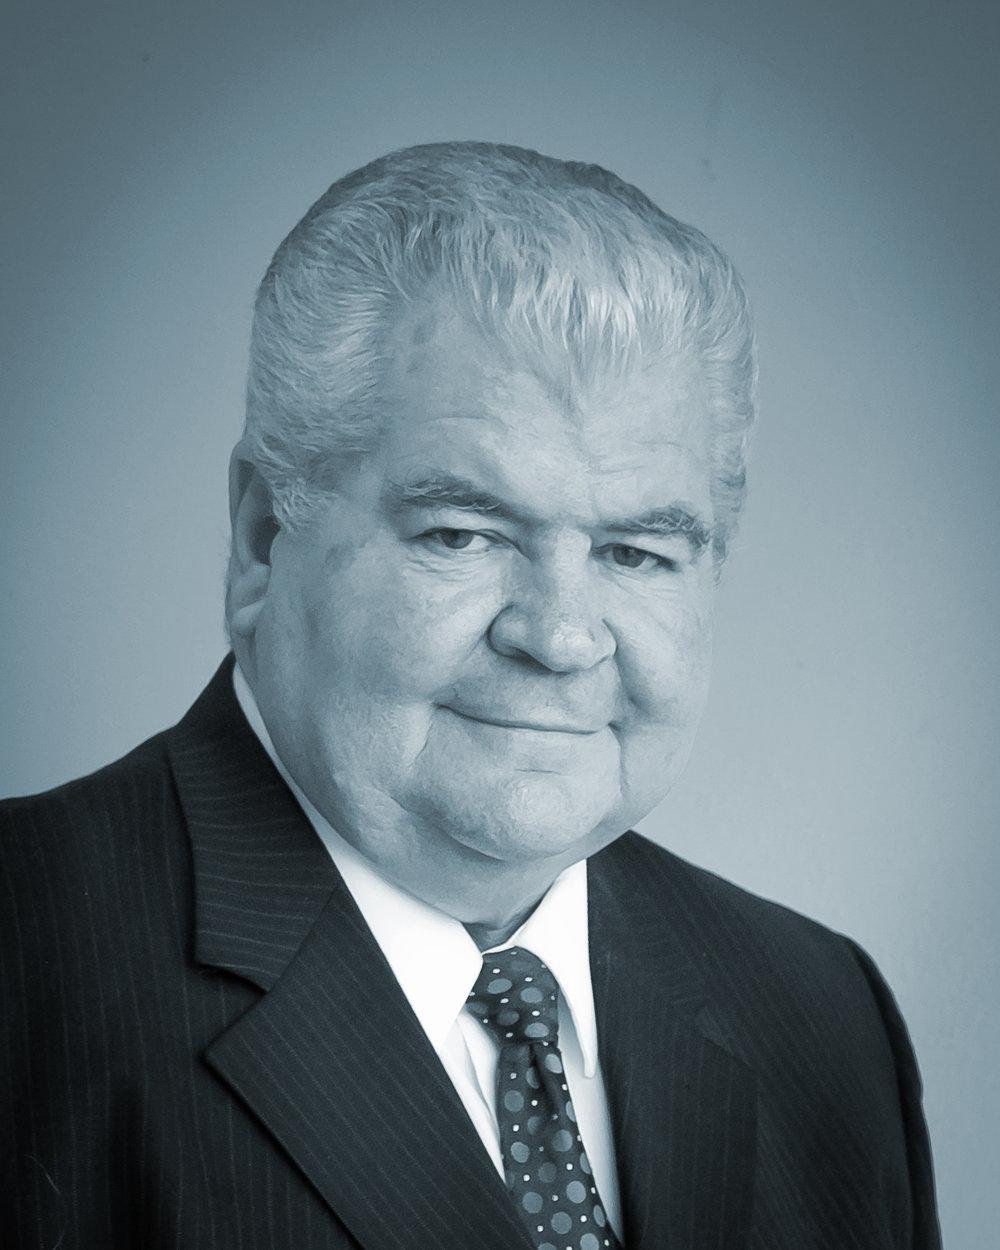 Dr-Tommy-Ashcraft-Portrait.jpg